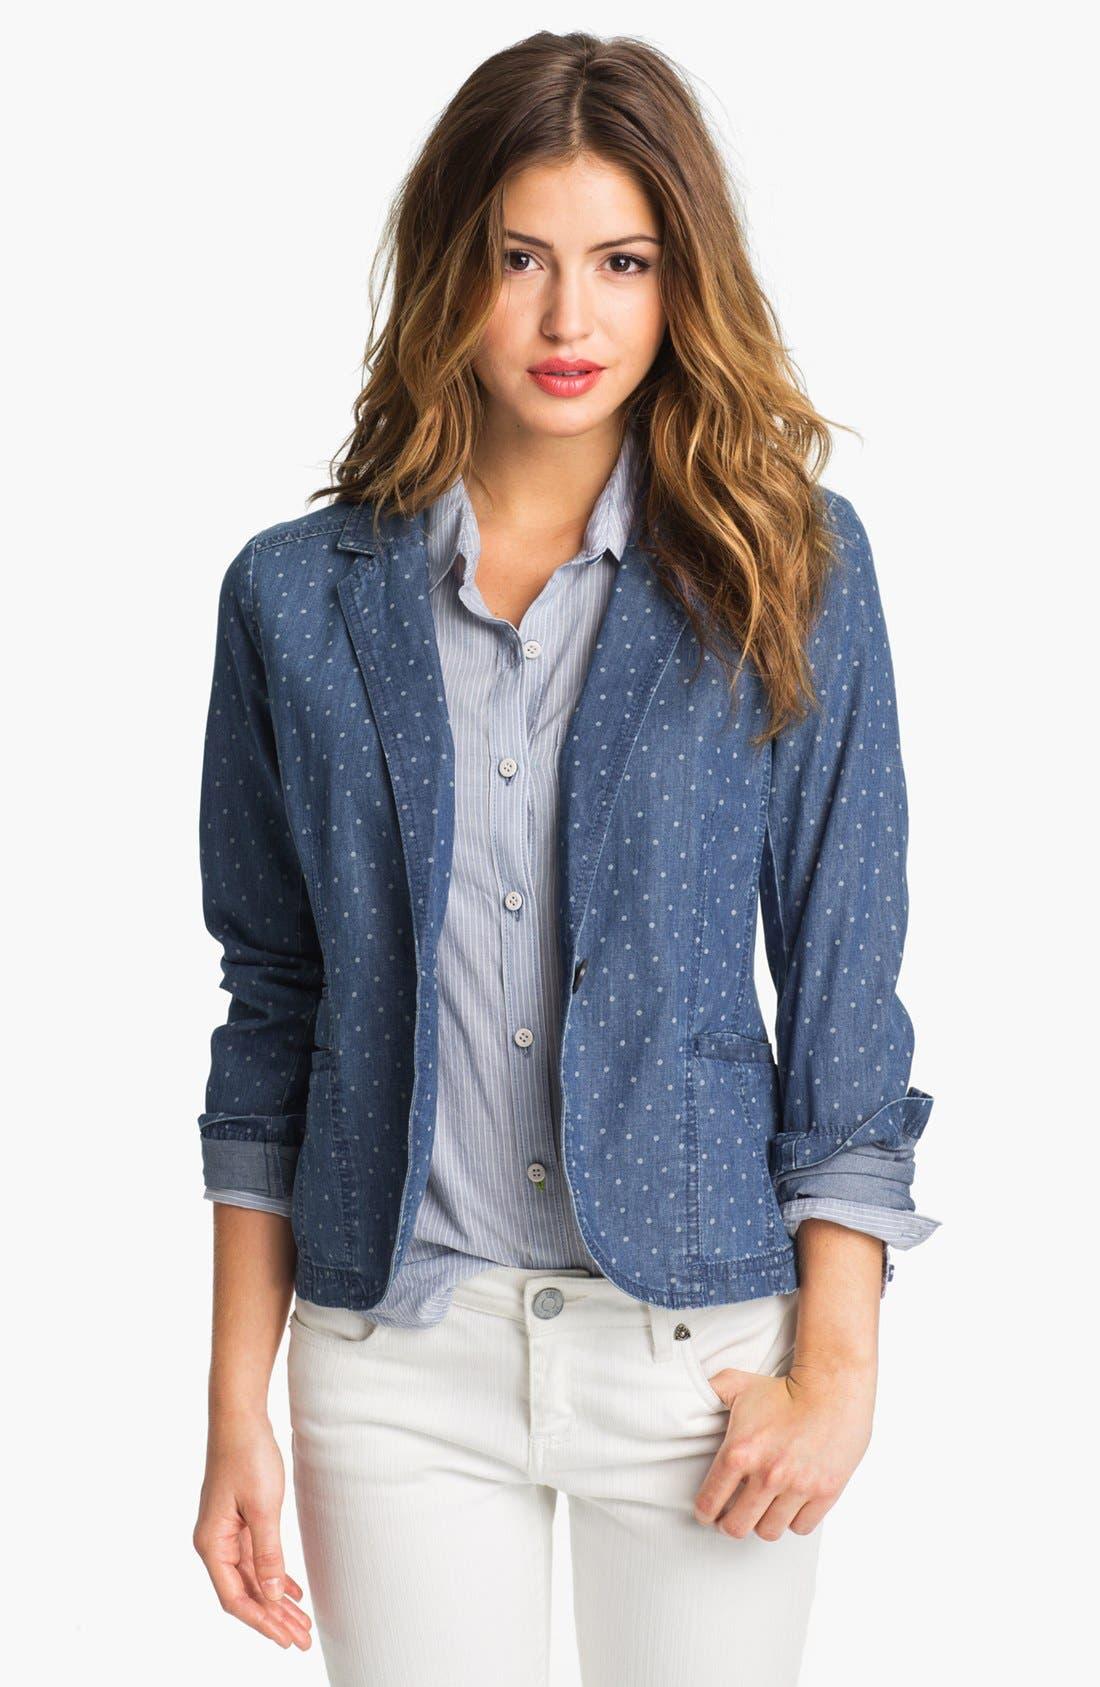 Alternate Image 1 Selected - Caslon® Dot Print Jacket (Petite)